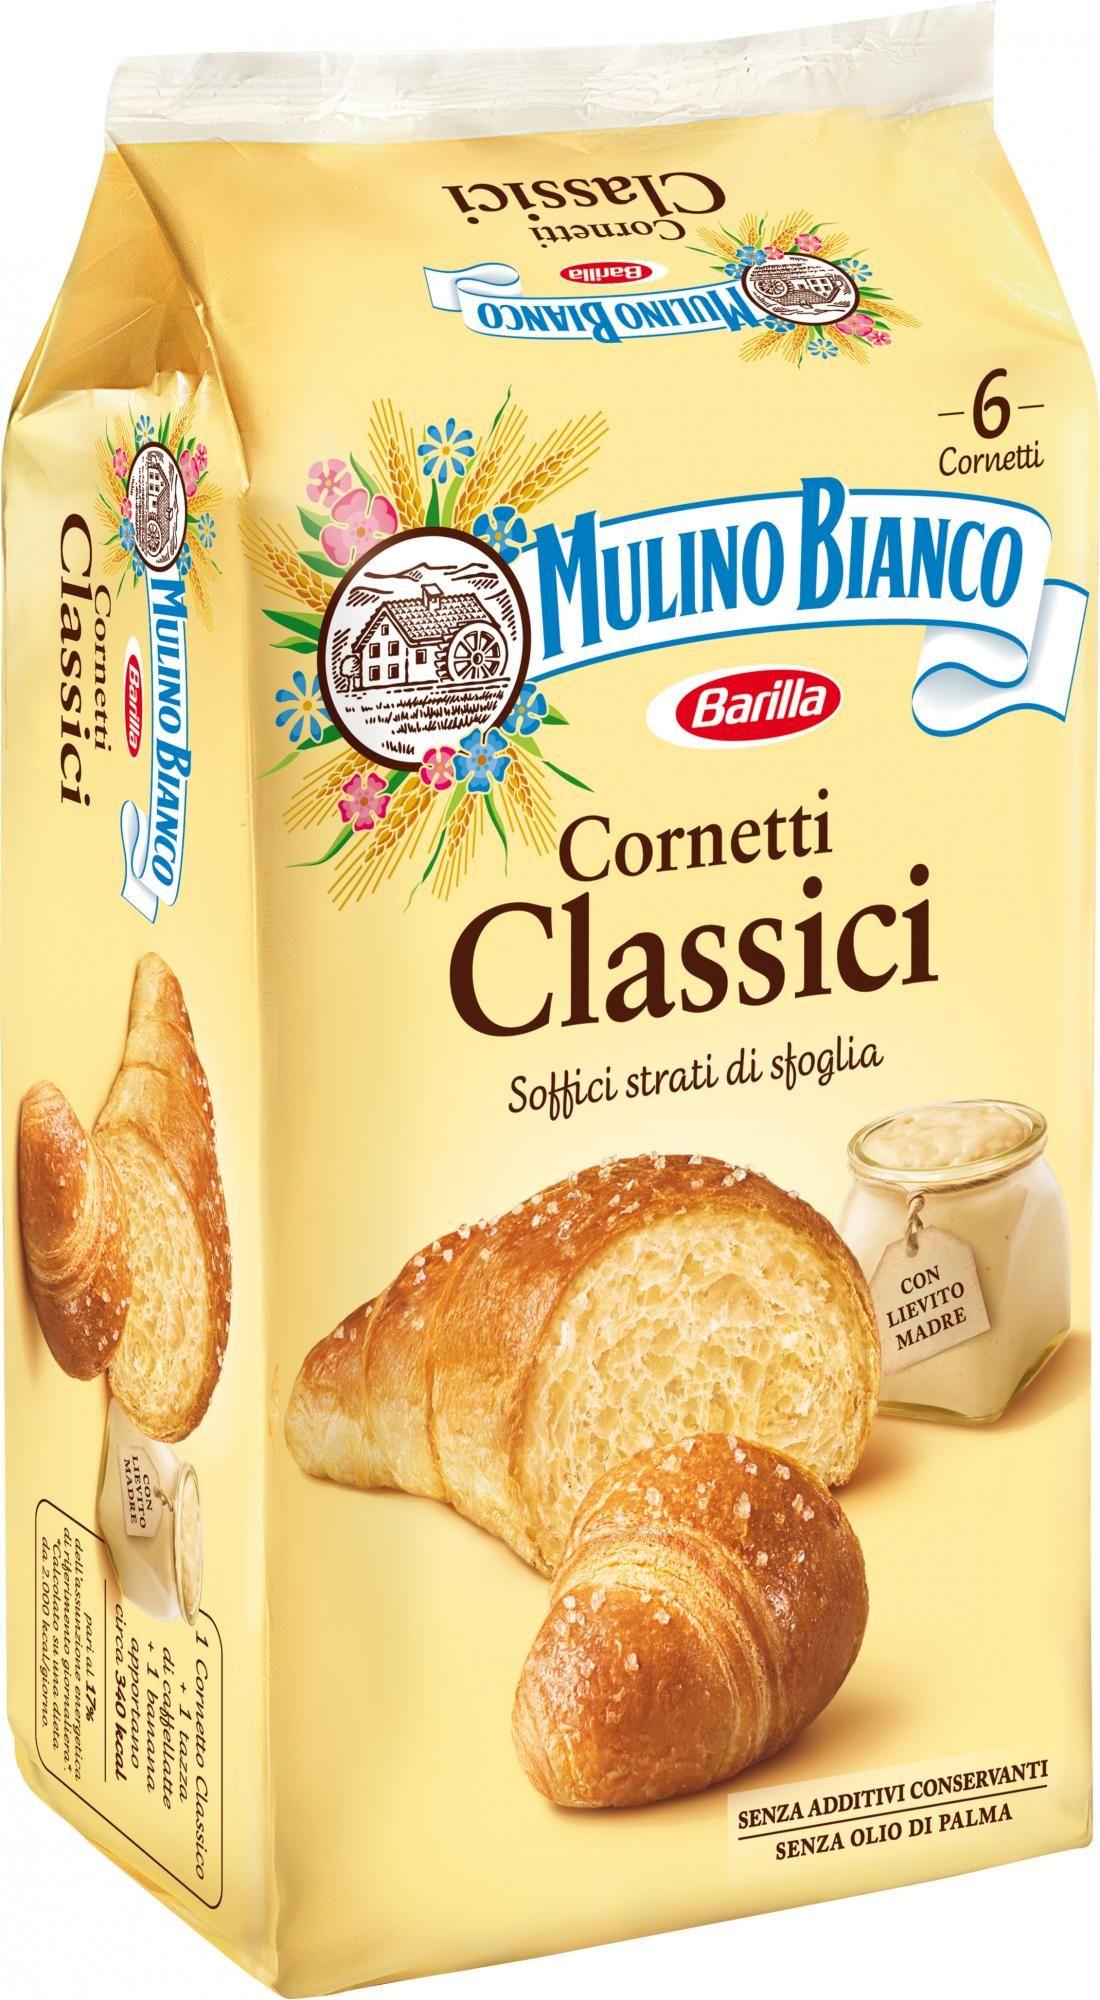 Cornetti classici Mulino Bianco 330g